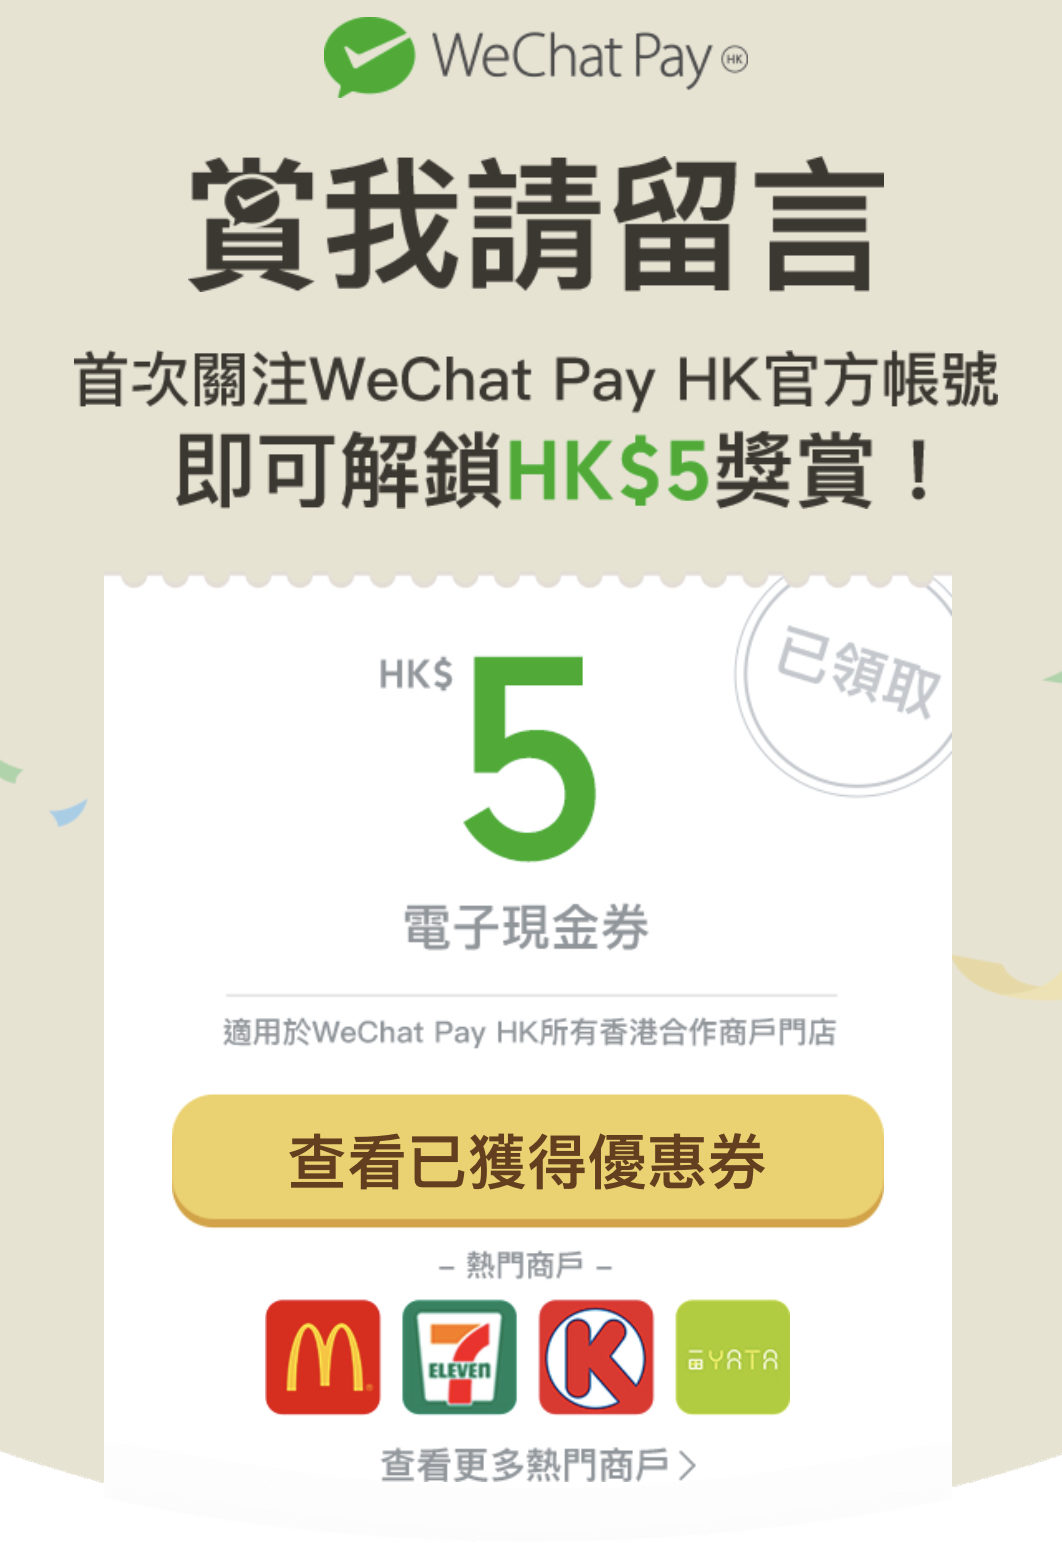 WeChatPayHK 賞我請留言